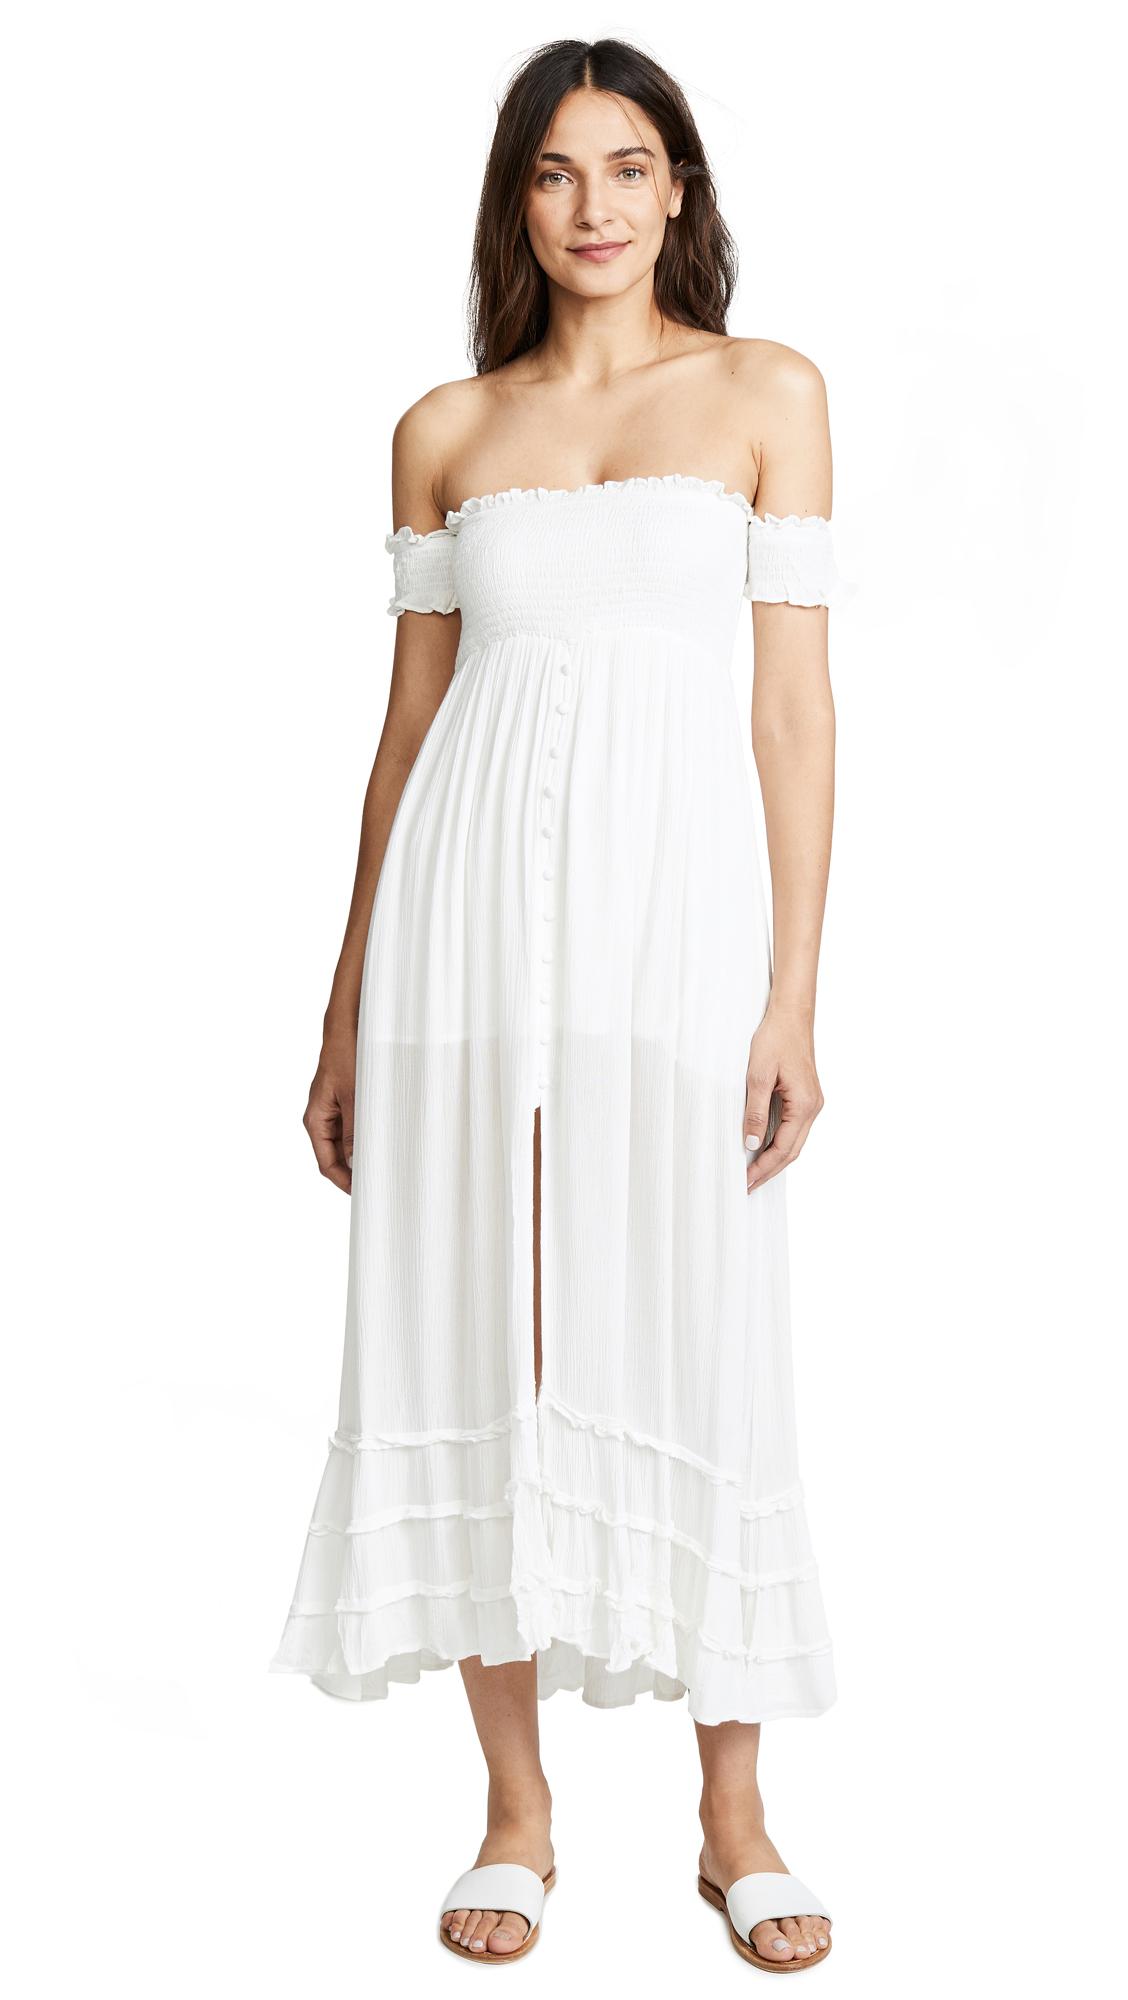 PilyQ Mishell Dress - White